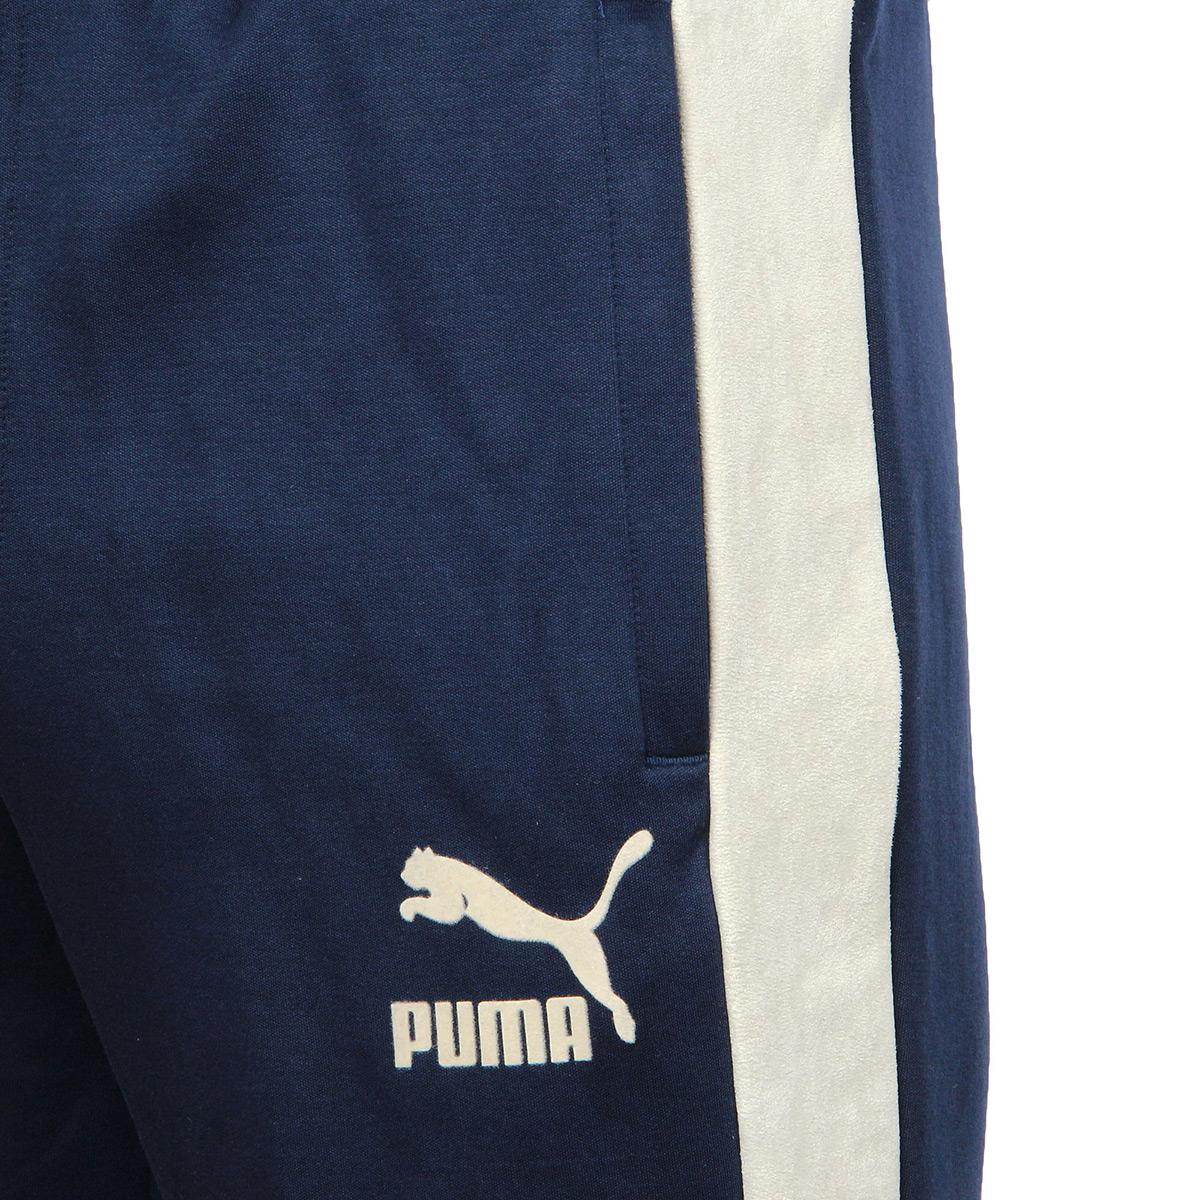 Puma T7 Pants inserts Suede 57570306, Pantalons homme